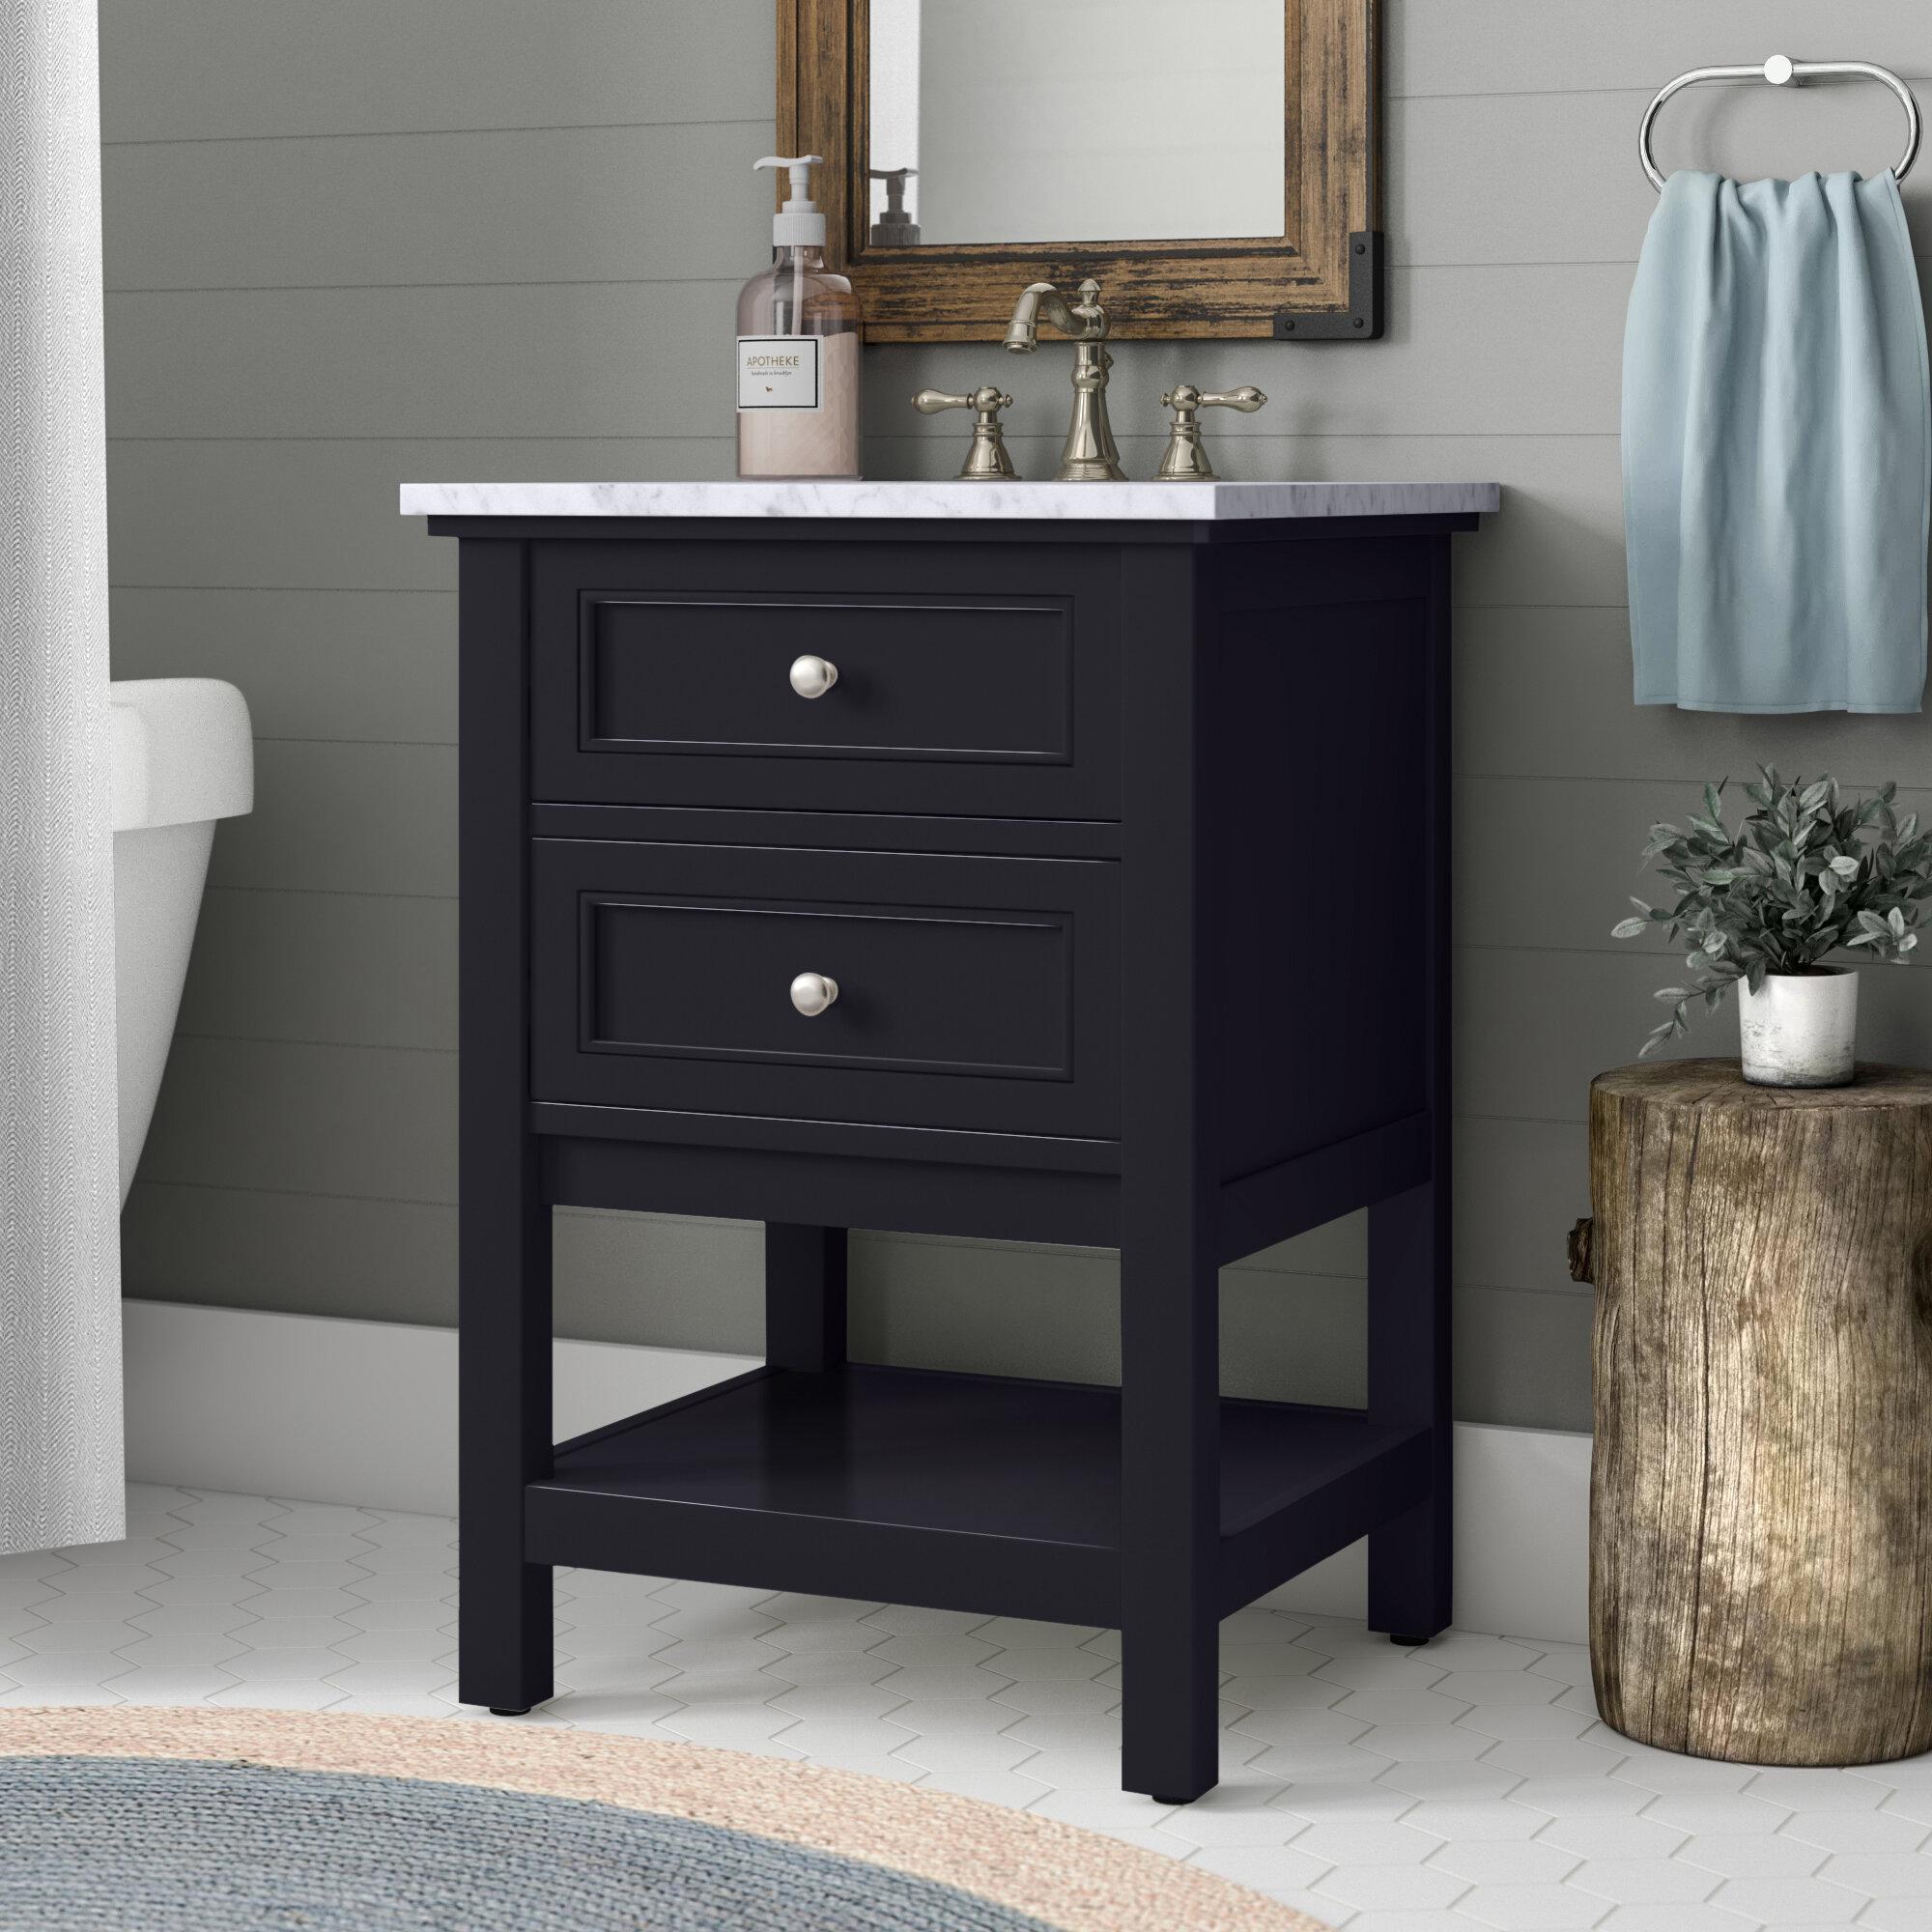 38+ 40 x 22 black bathroom cabinet vanity ideas